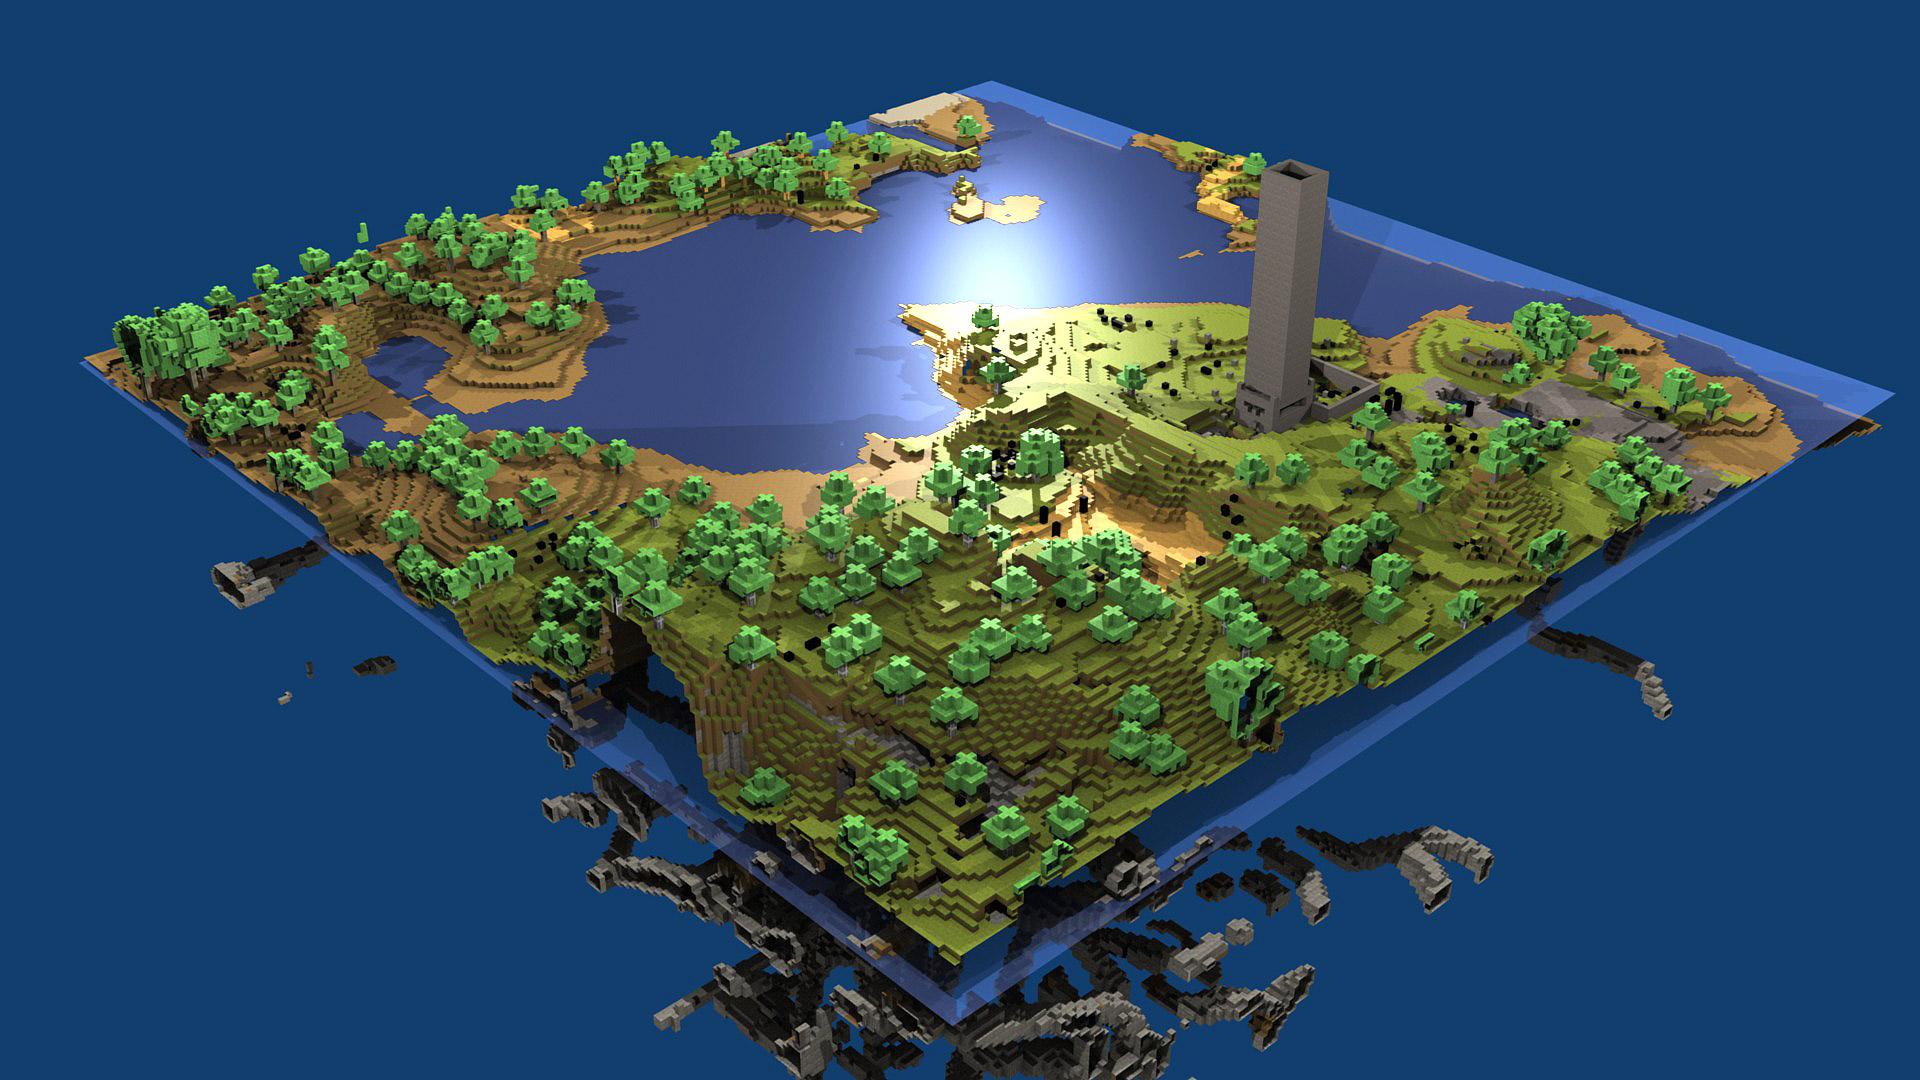 Minecraft World Google Skins Minecraft World Google Backgrounds 1920x1080